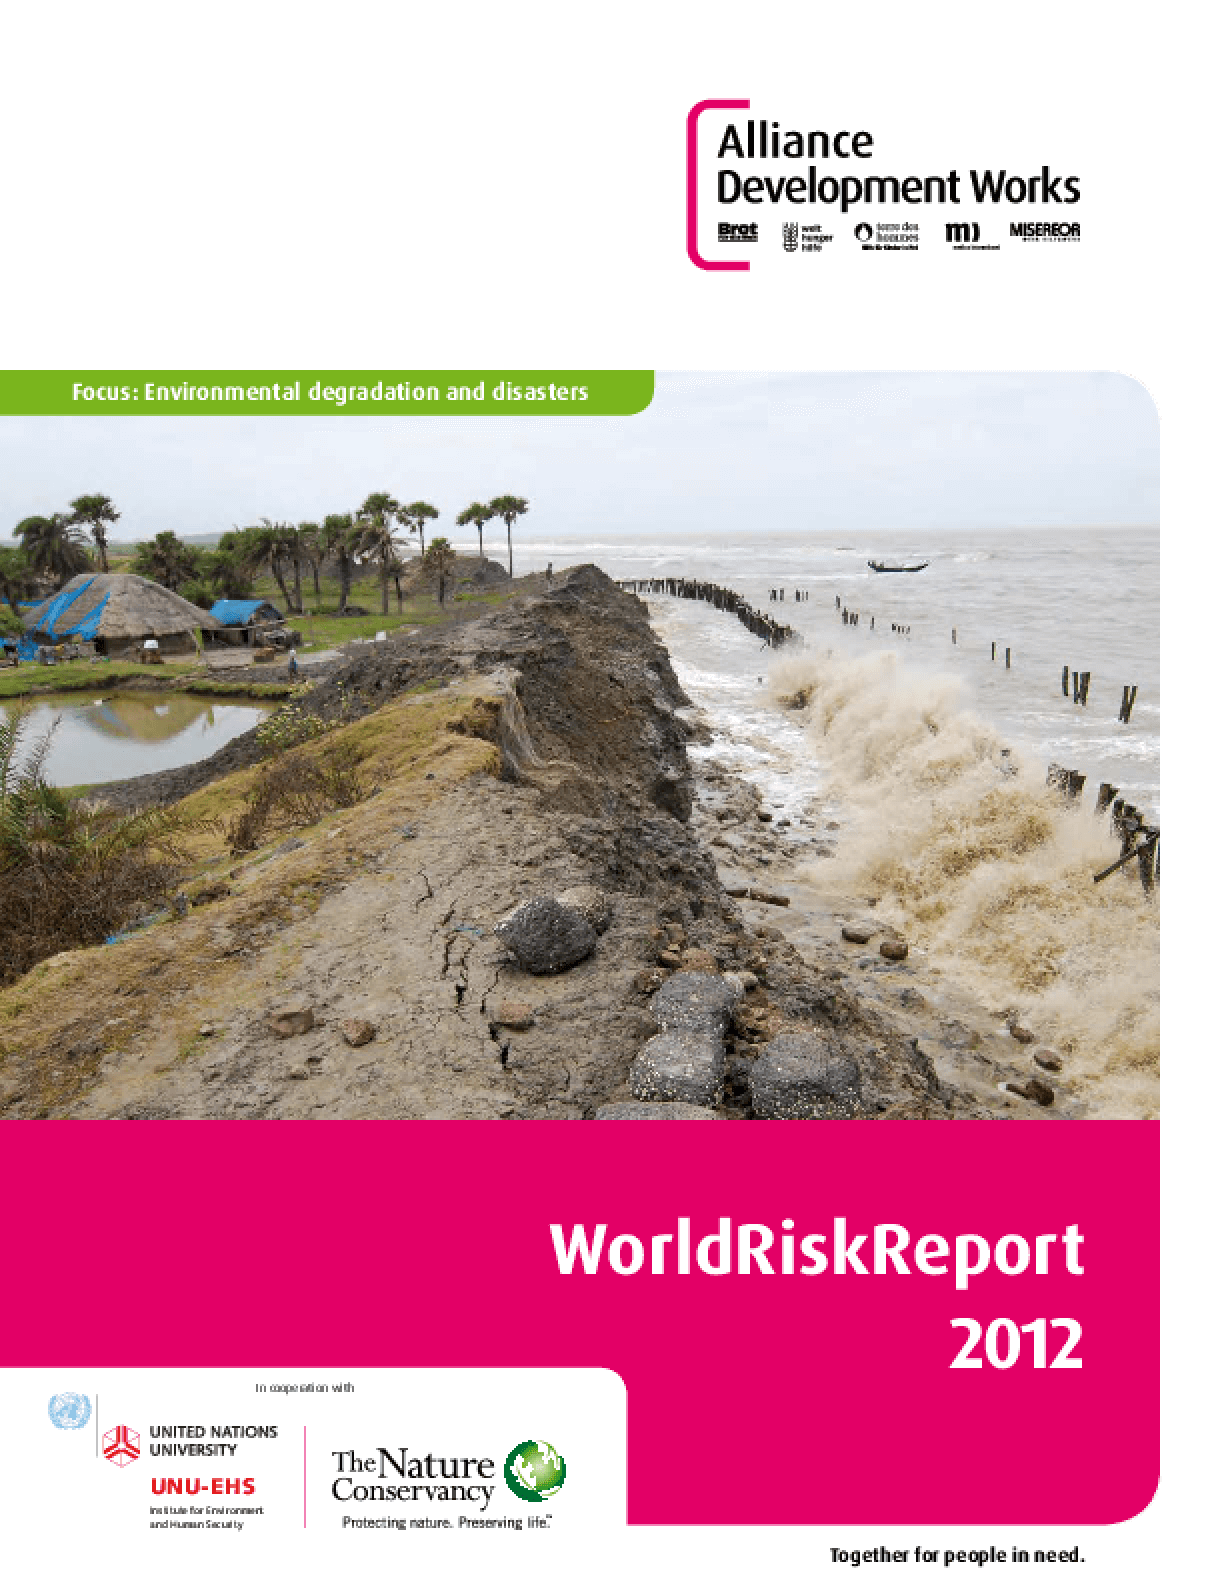 World Risk Report 2012